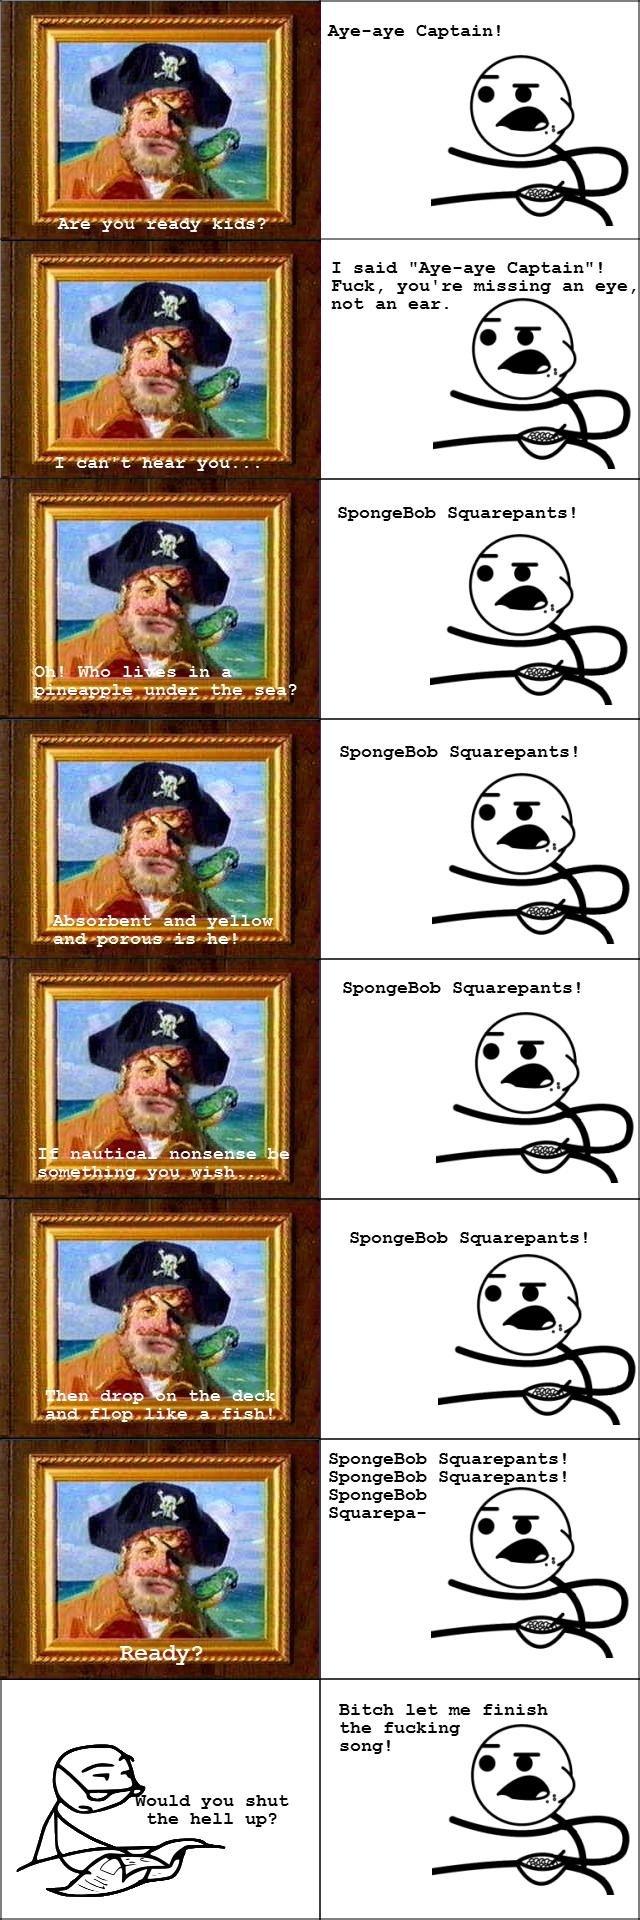 "spongebob. . Average Captain'. I said "" Captain""! Uuok, you' re missing an eye, not; an ear. Spongebob Squa: japanes'. Spongebod: Squarepants! Absorbent and yel spongebob funny"